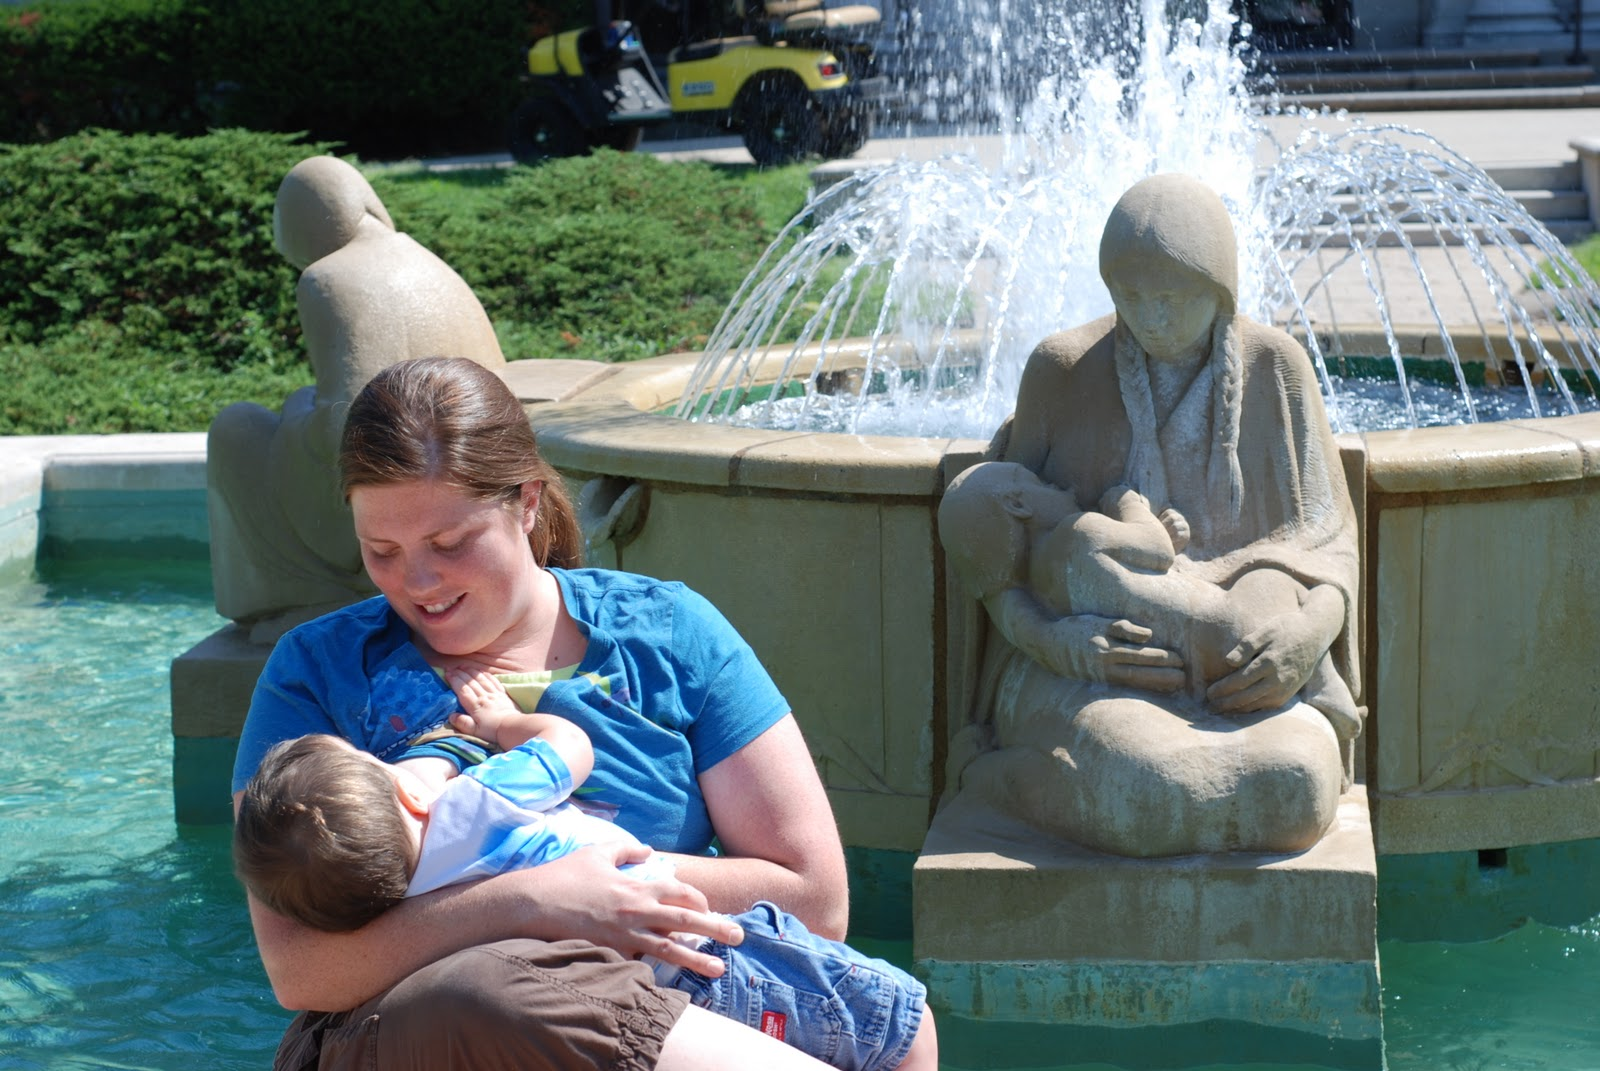 1900 s women nursing babies in public  big city